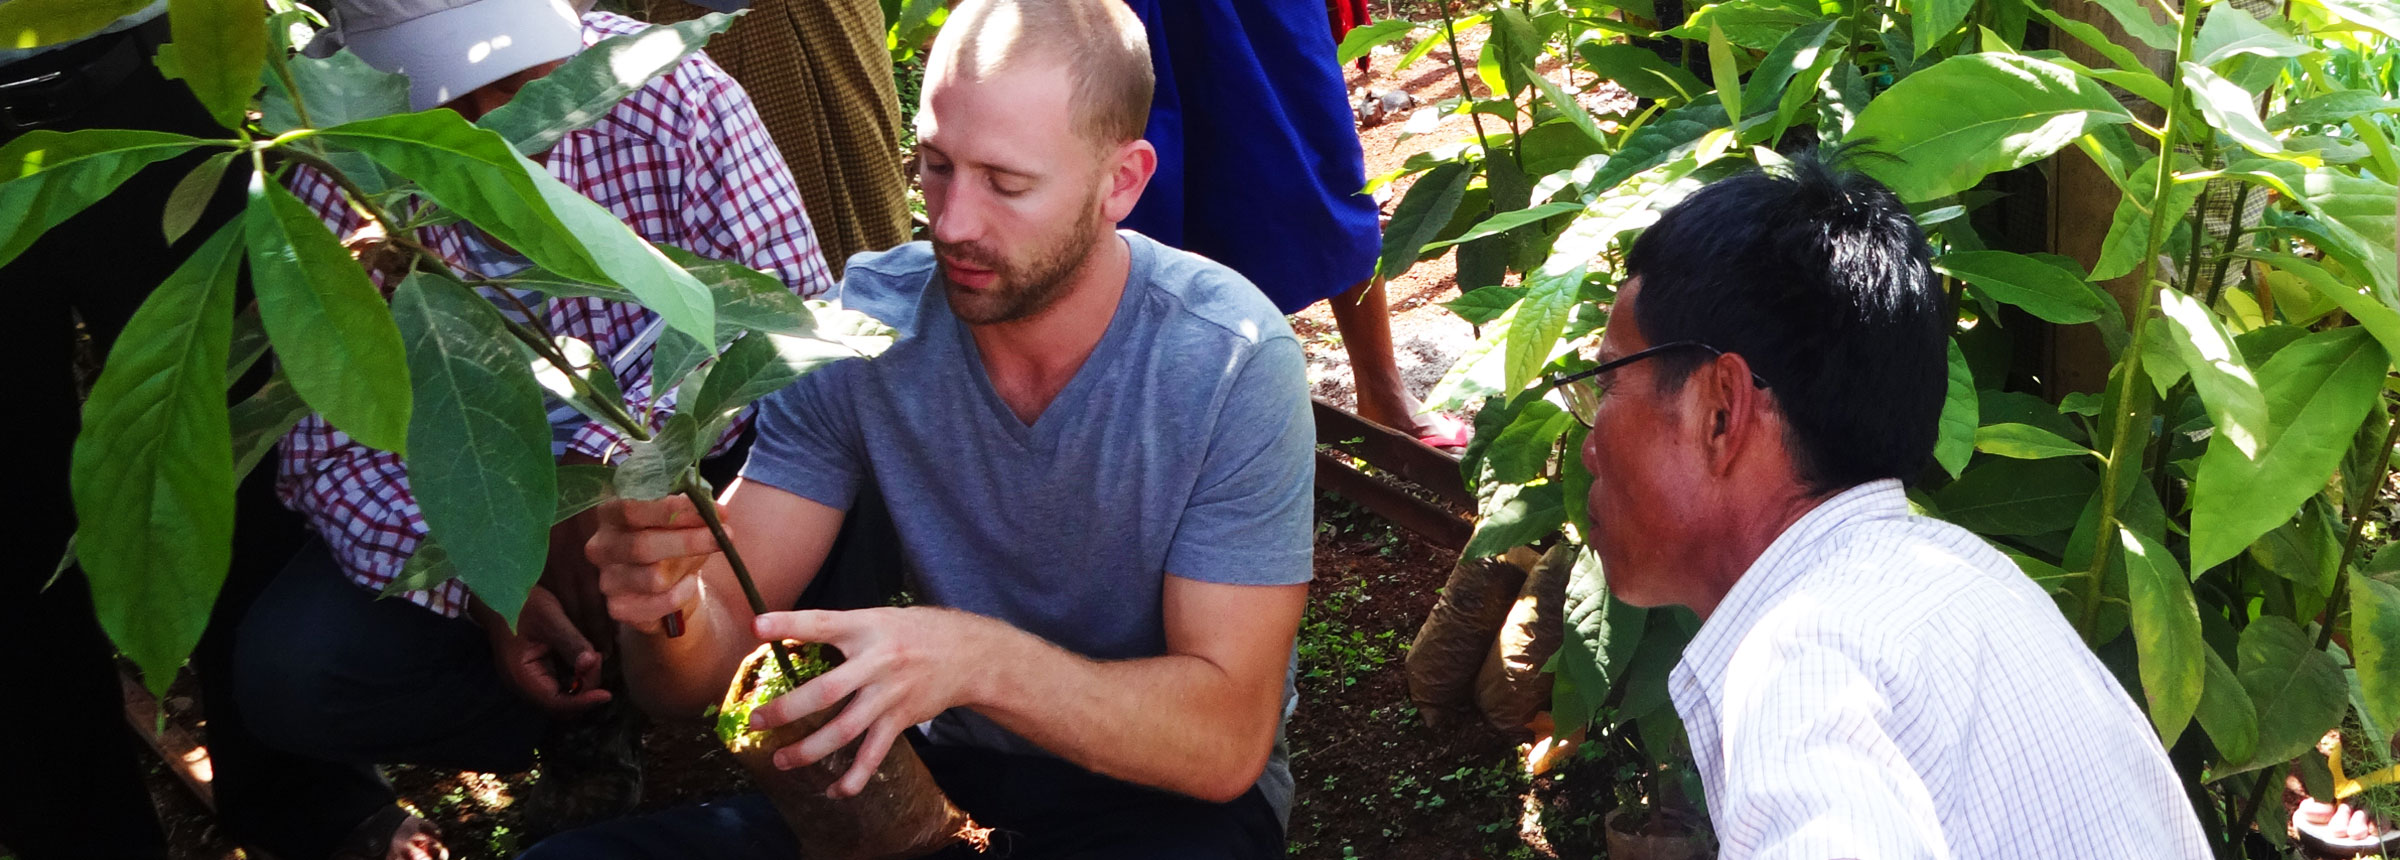 Volunteer demonstrating planting technique to farmer